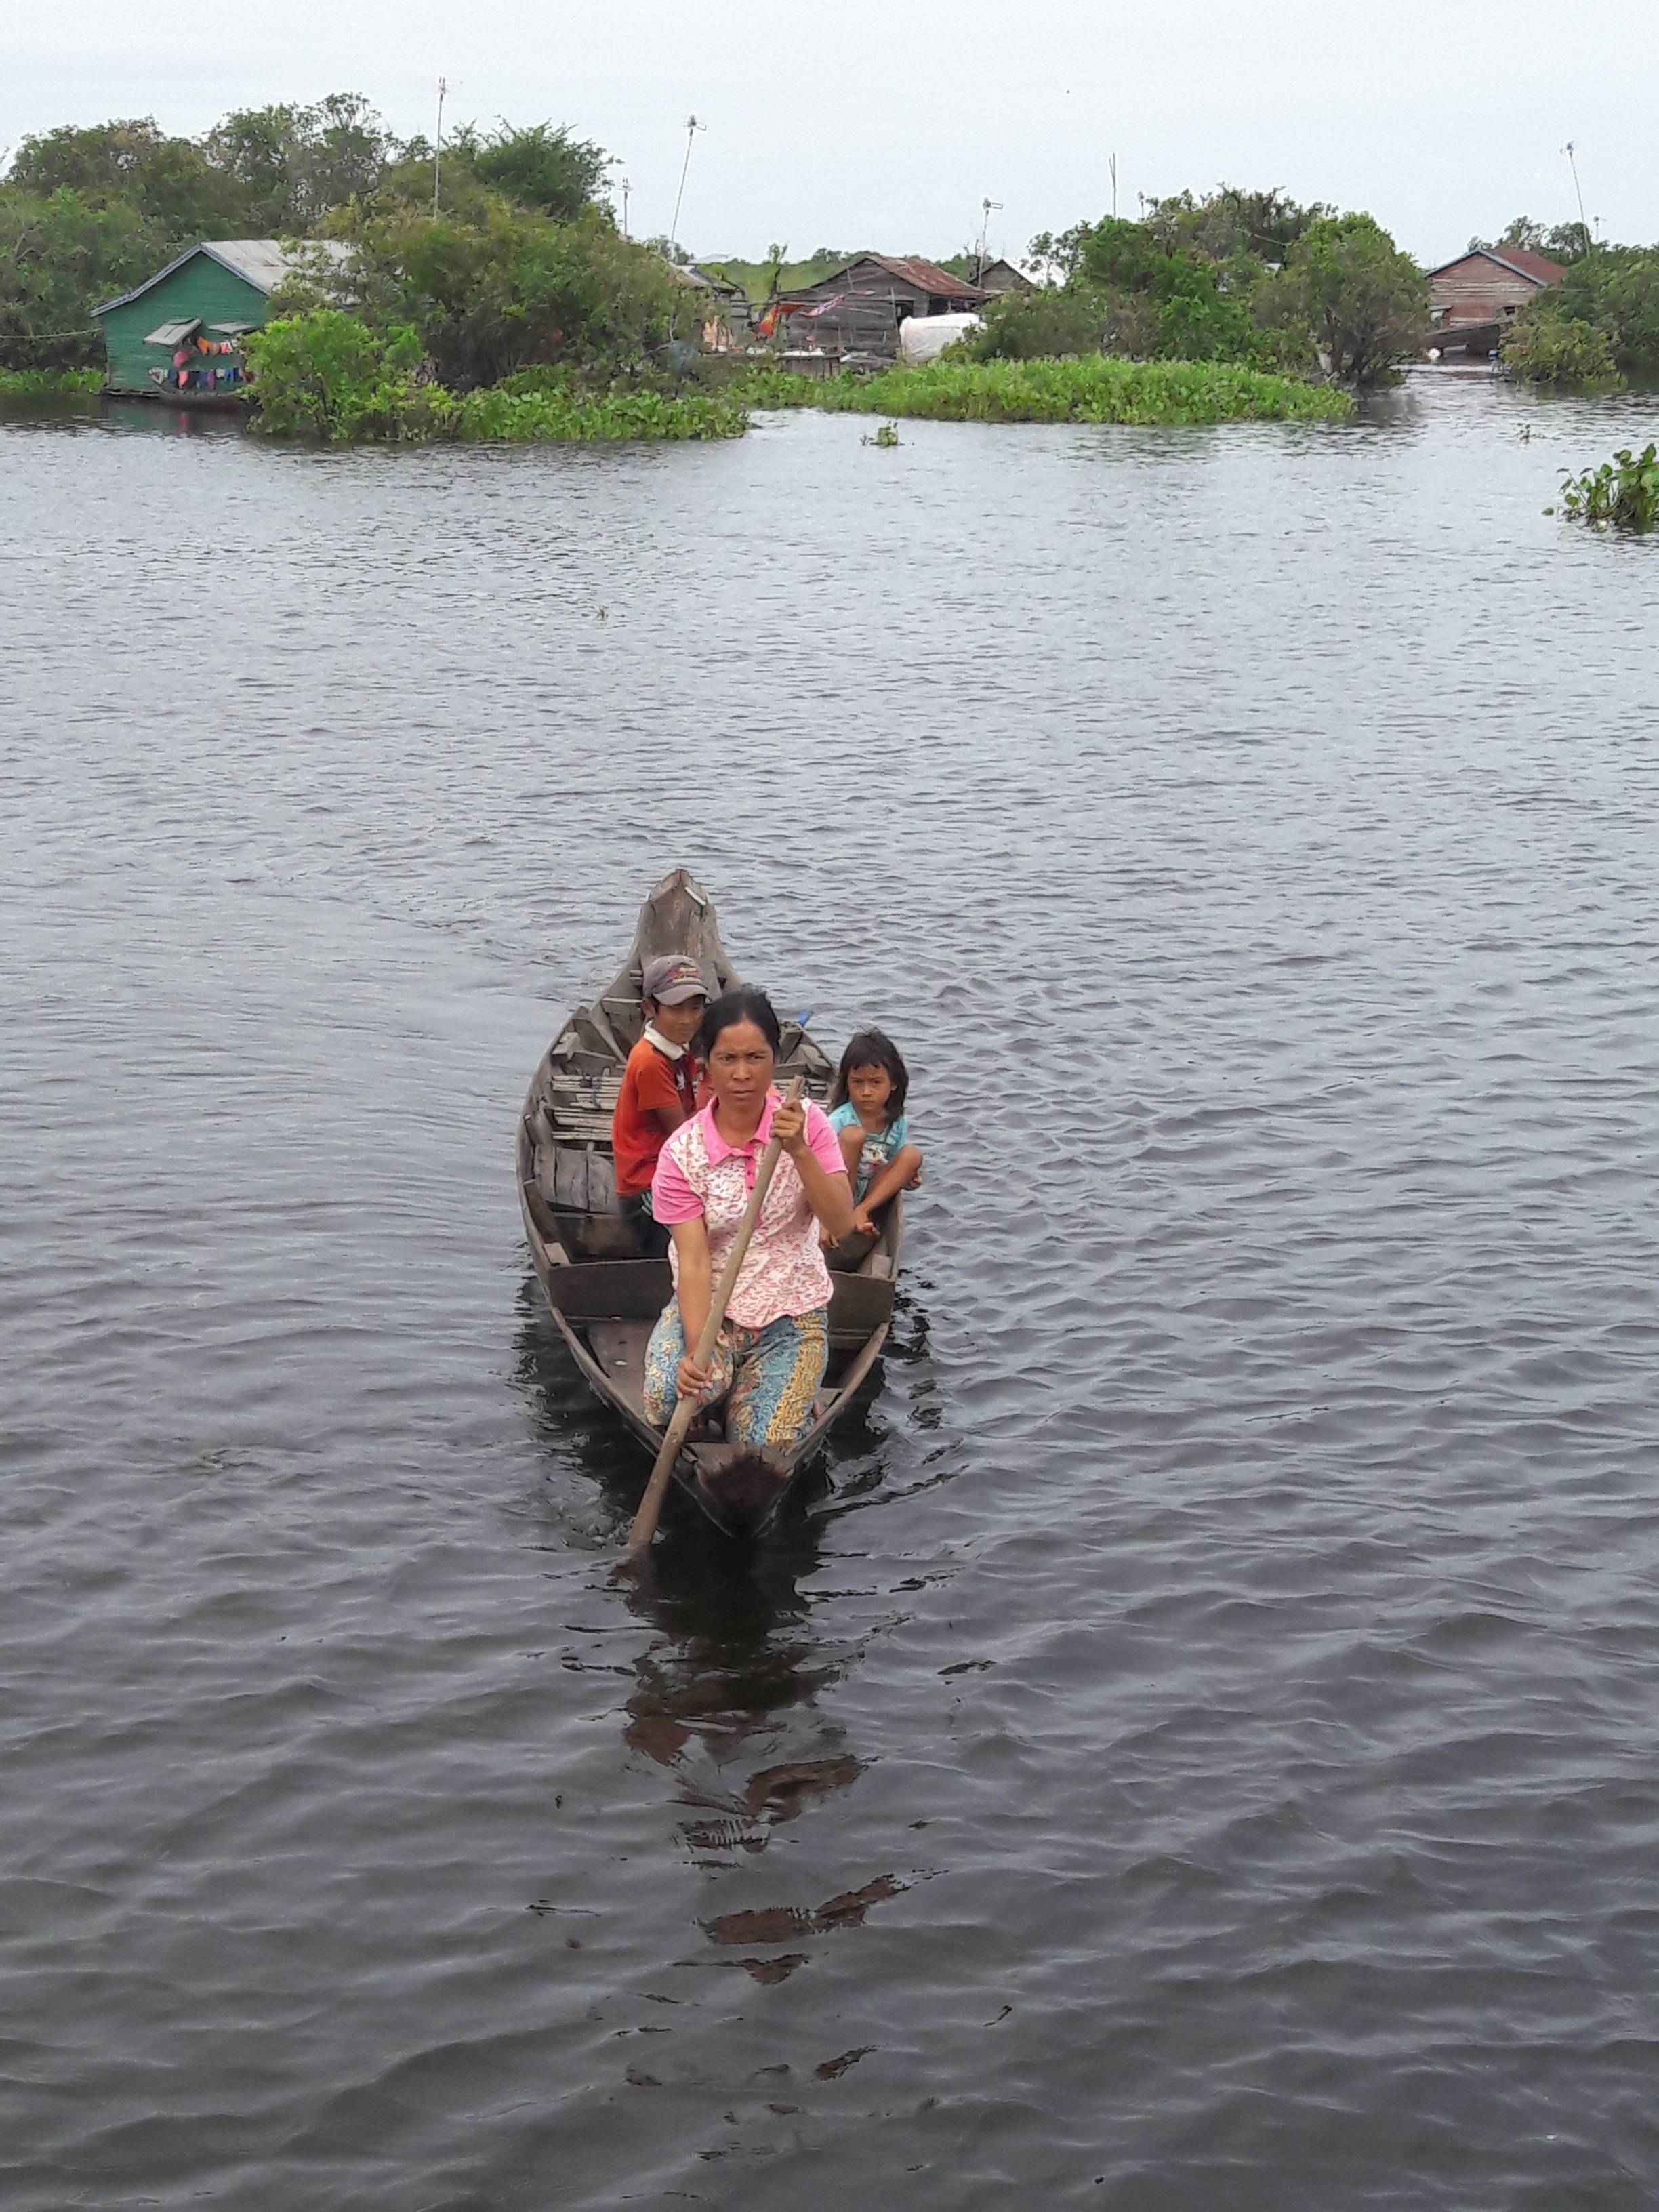 Photo 2: De Siem Reap à Battambang en bateau